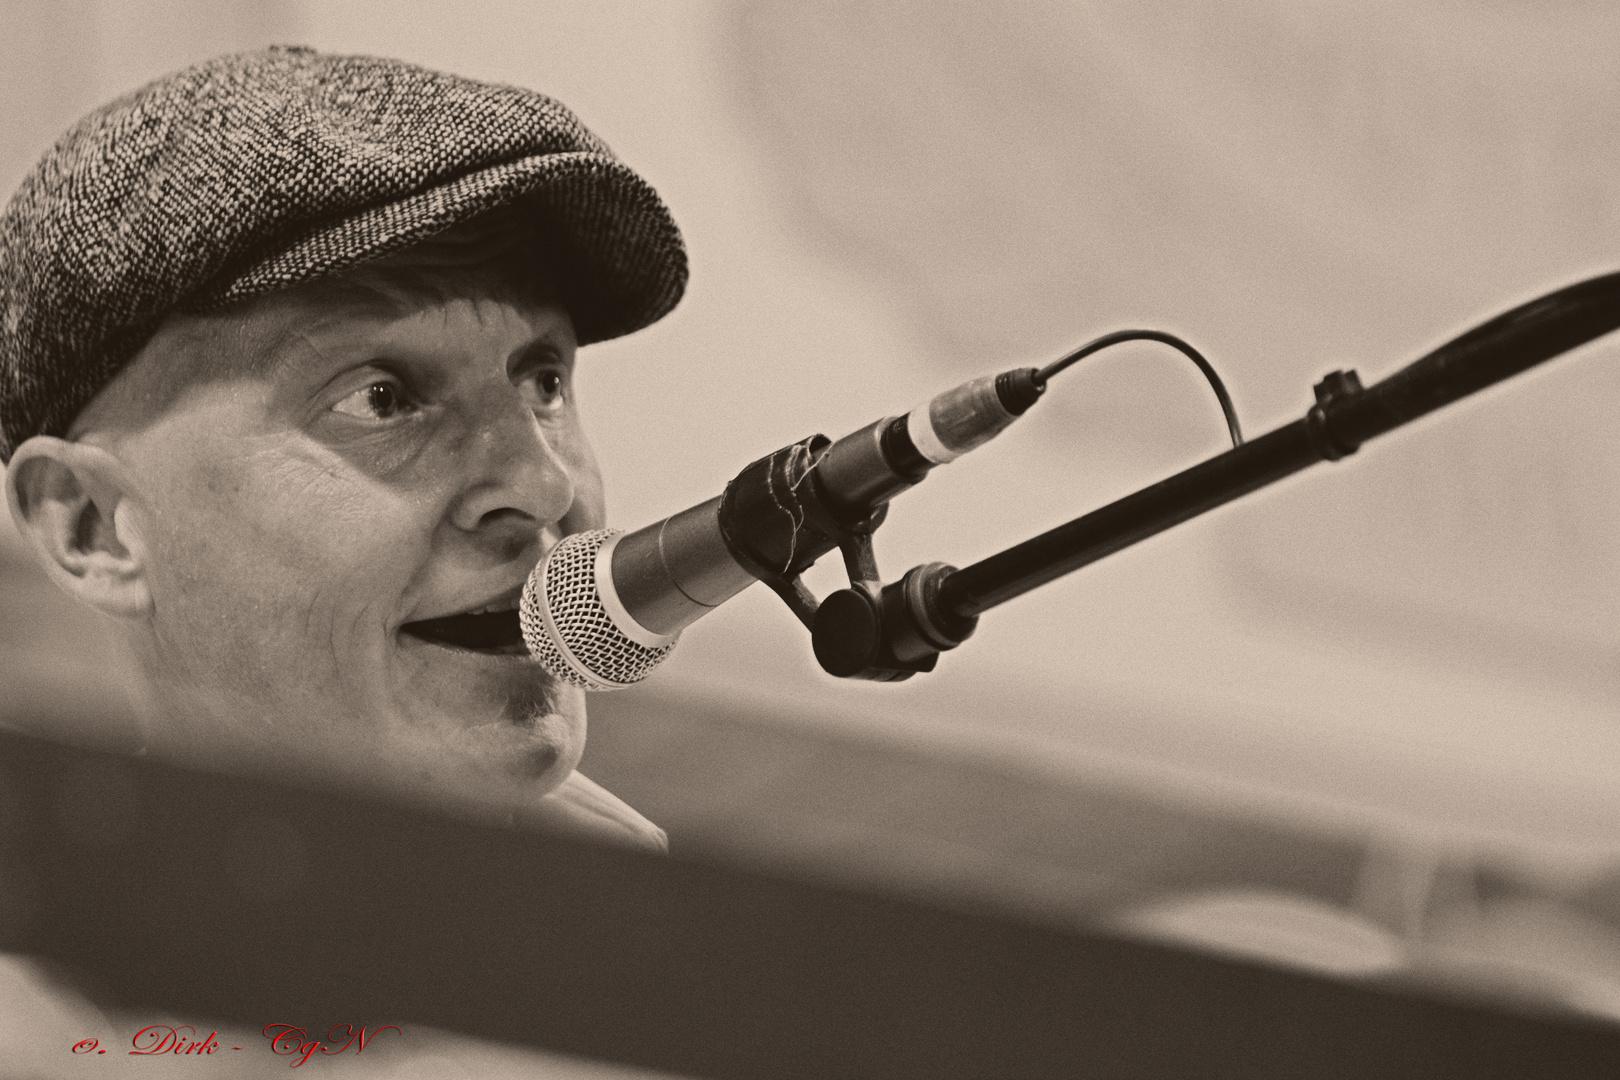 Jochen Damm